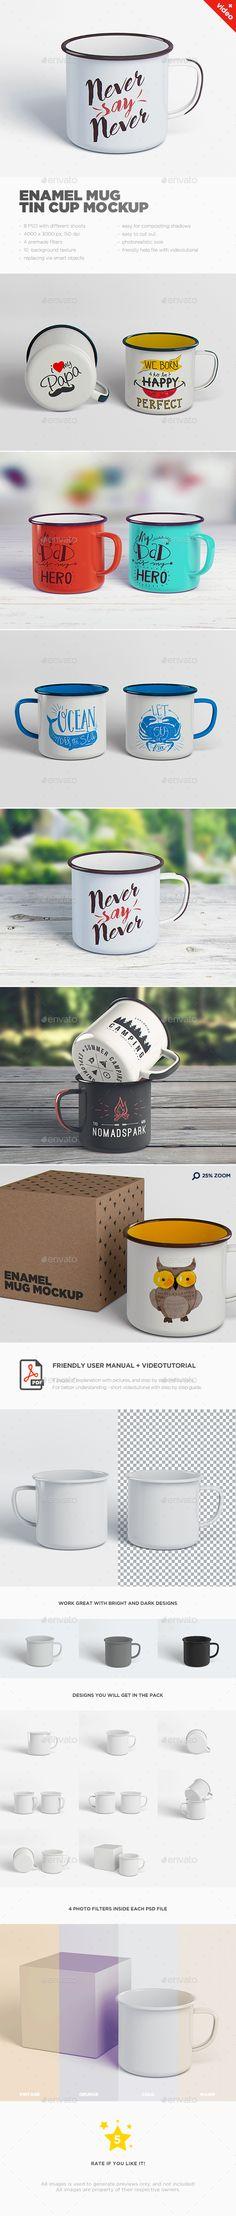 Enamel Mug / Tin Cup MockUp. Download here: http://graphicriver.net/item/enamel-mug-tin-cup-mockup/16710929?ref=ksioks